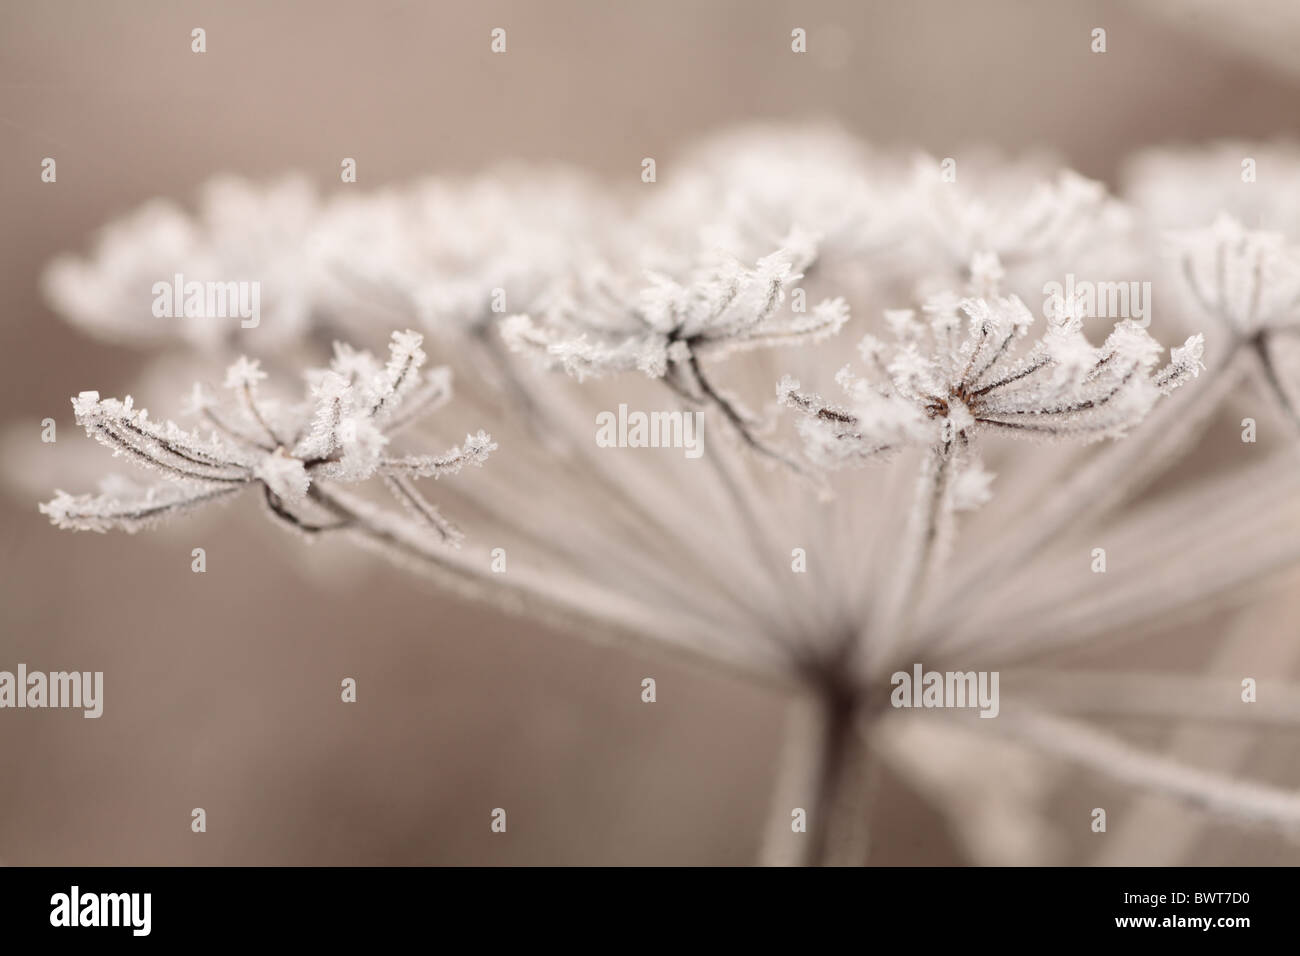 Angelica sylvestris wild nature natural wildlife environment environmental europe european powys wales britain british - Stock Image